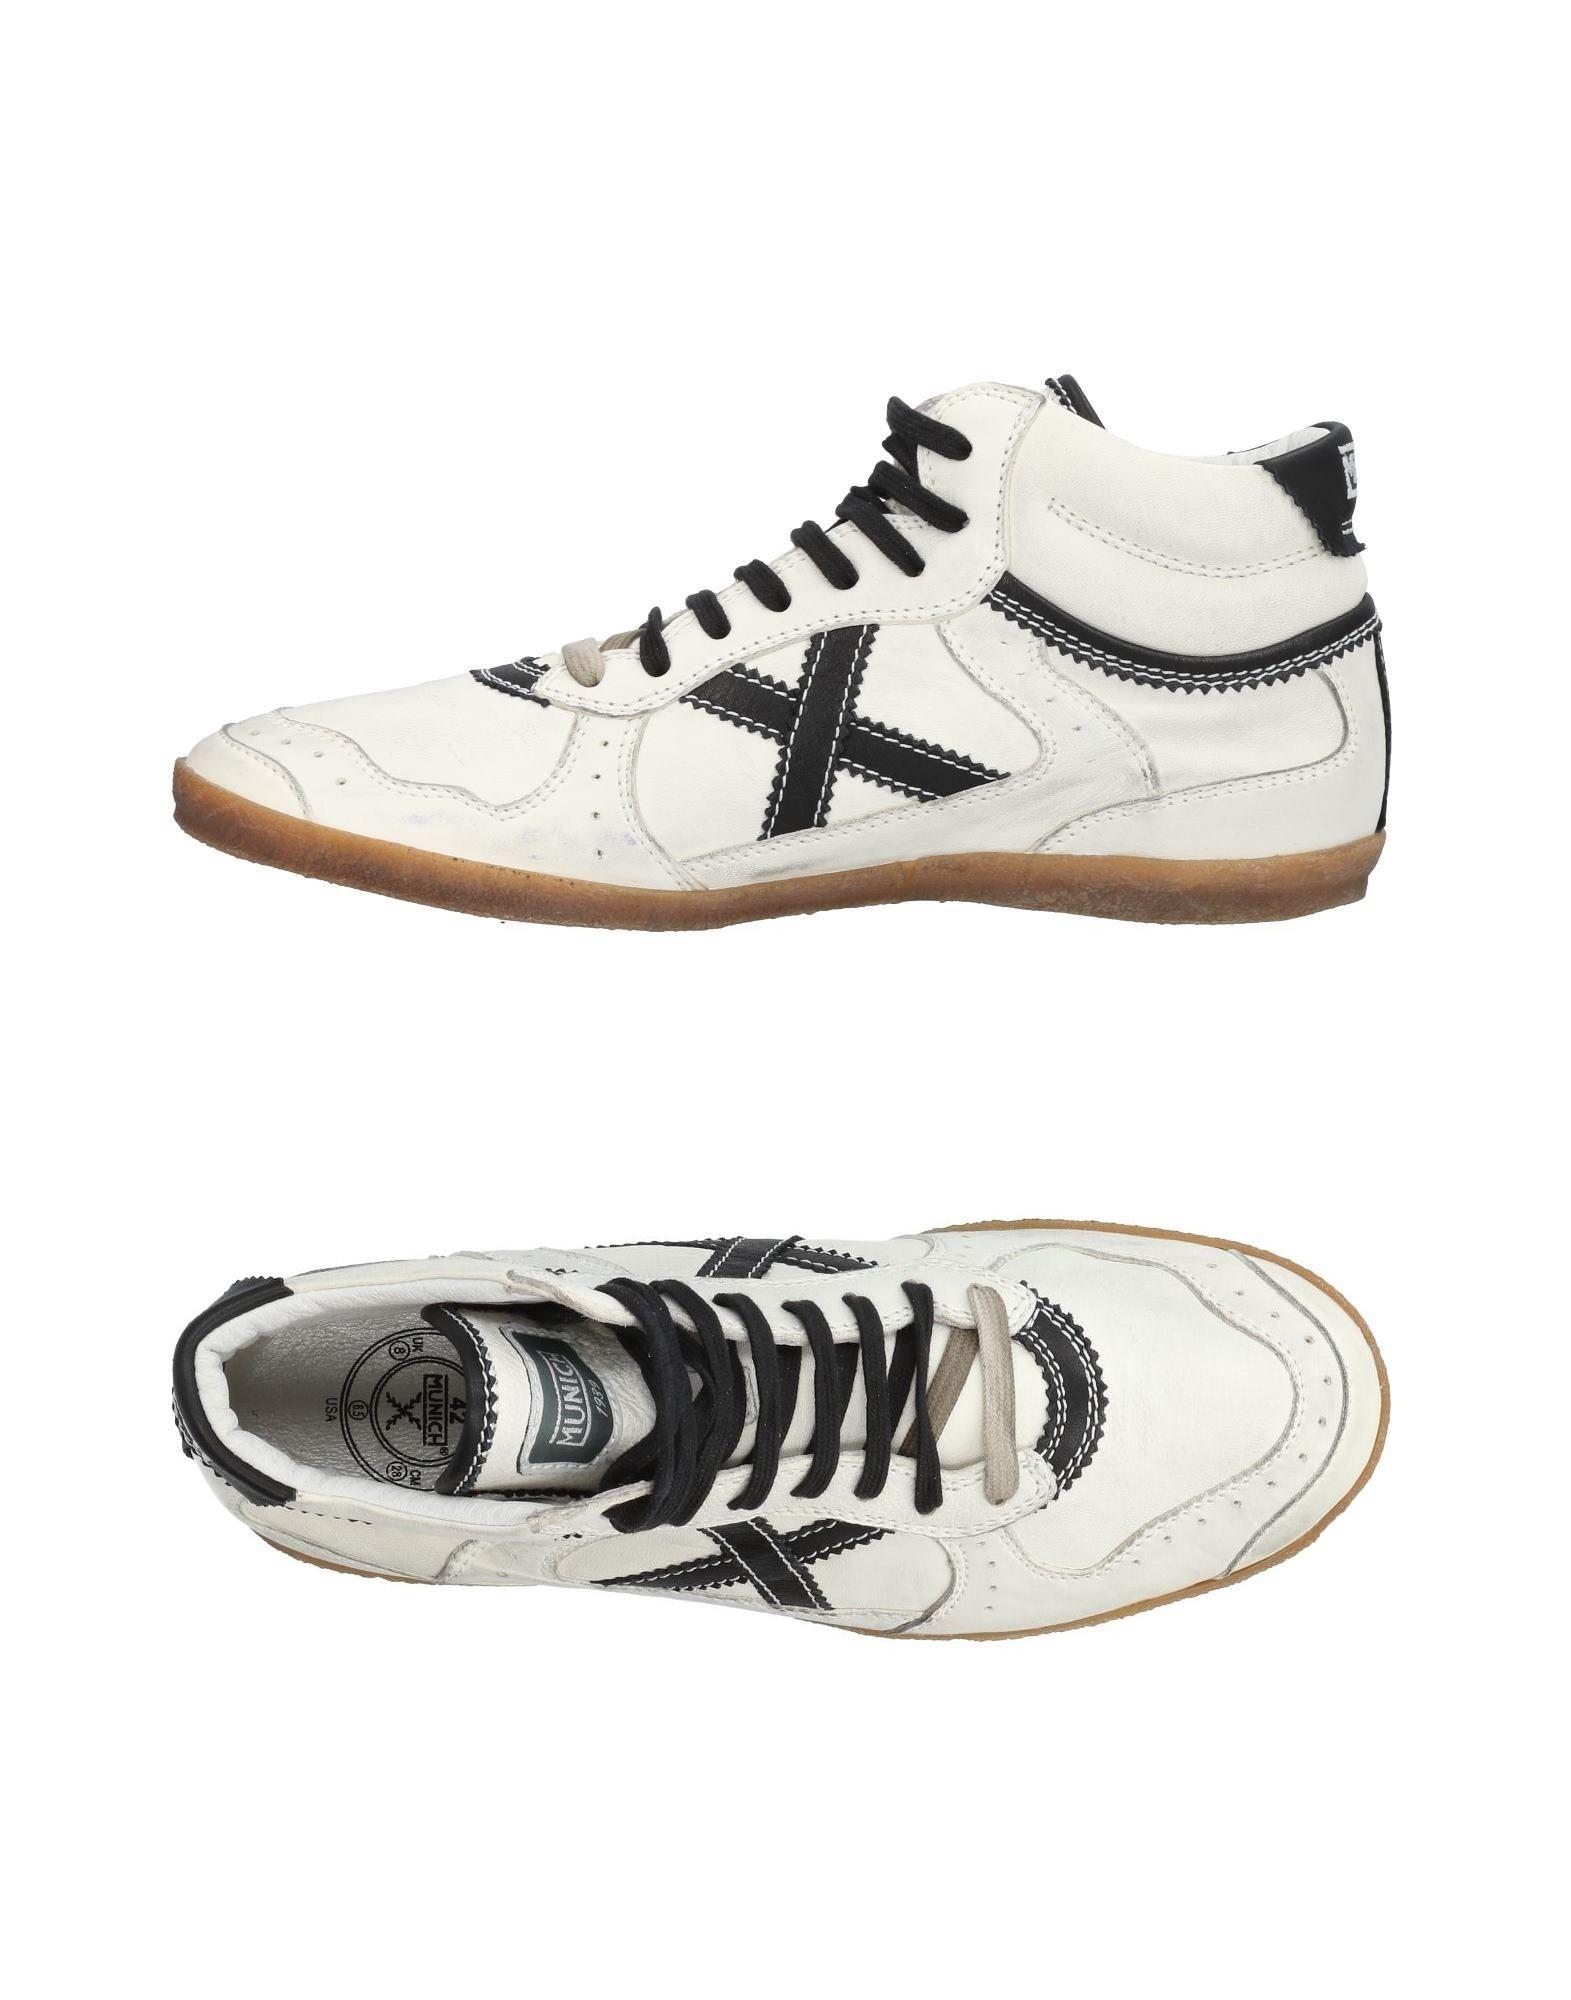 Moda Sneakers Munich Uomo - 11453579BF 11453579BF - 041c59